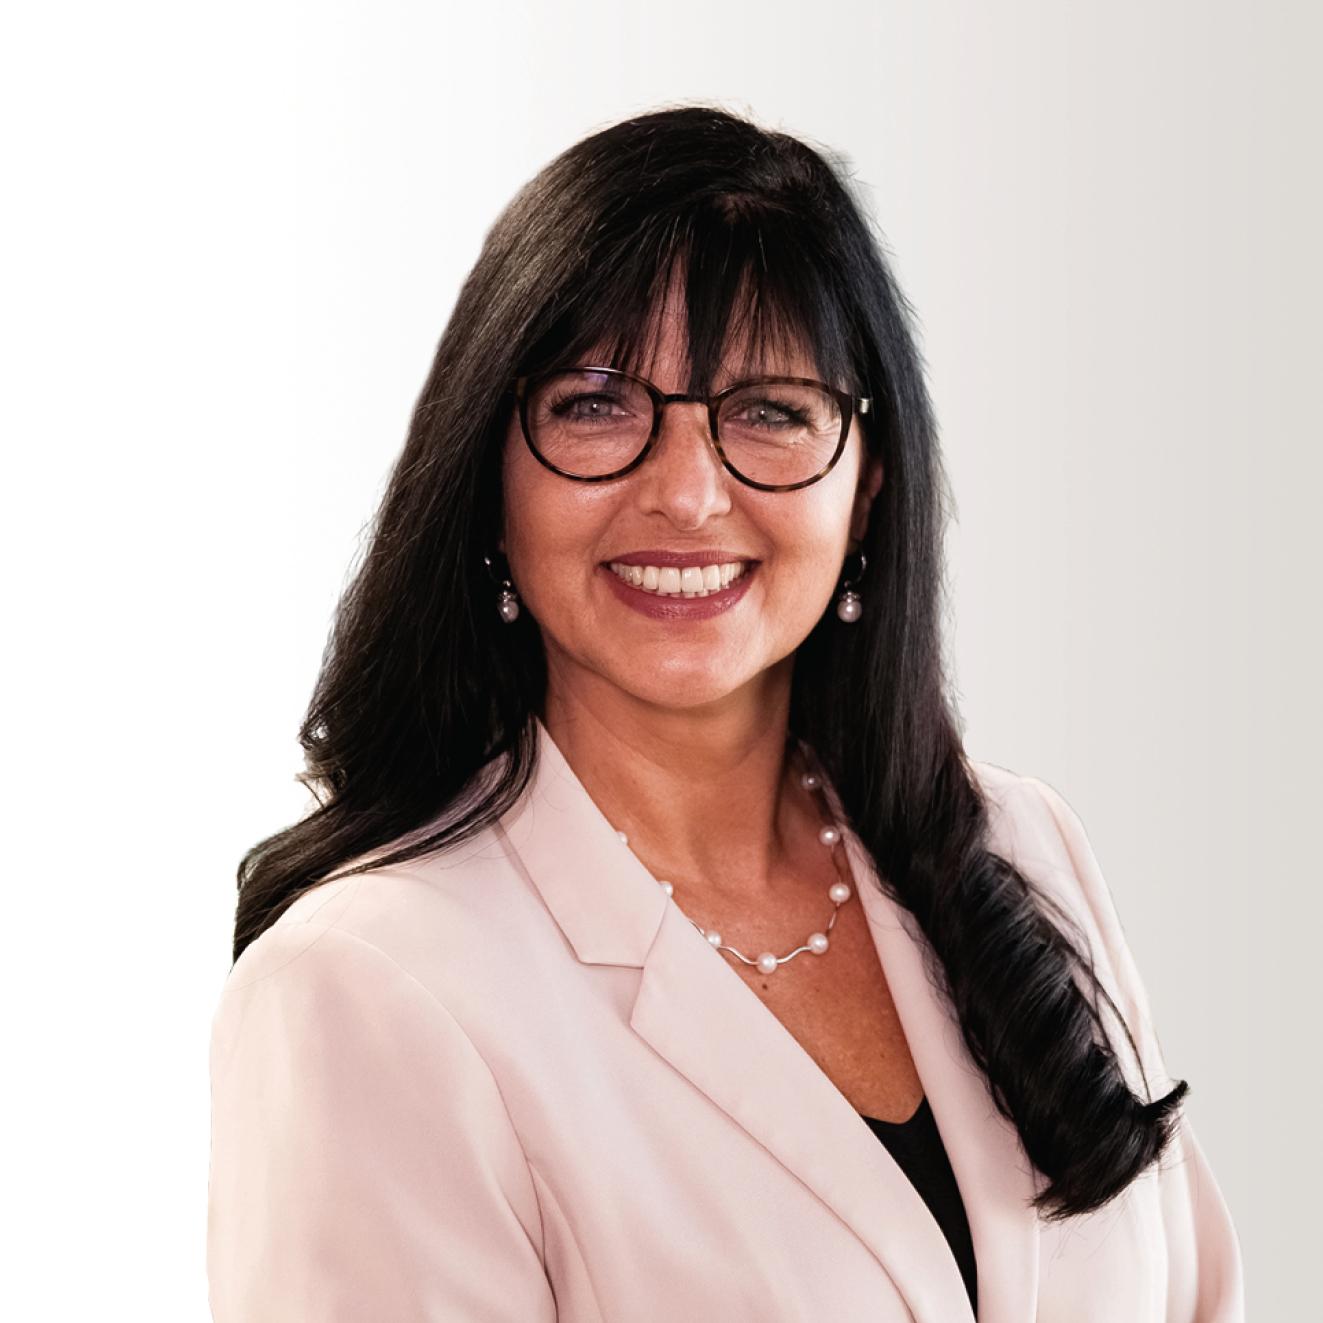 Stephanie Seel